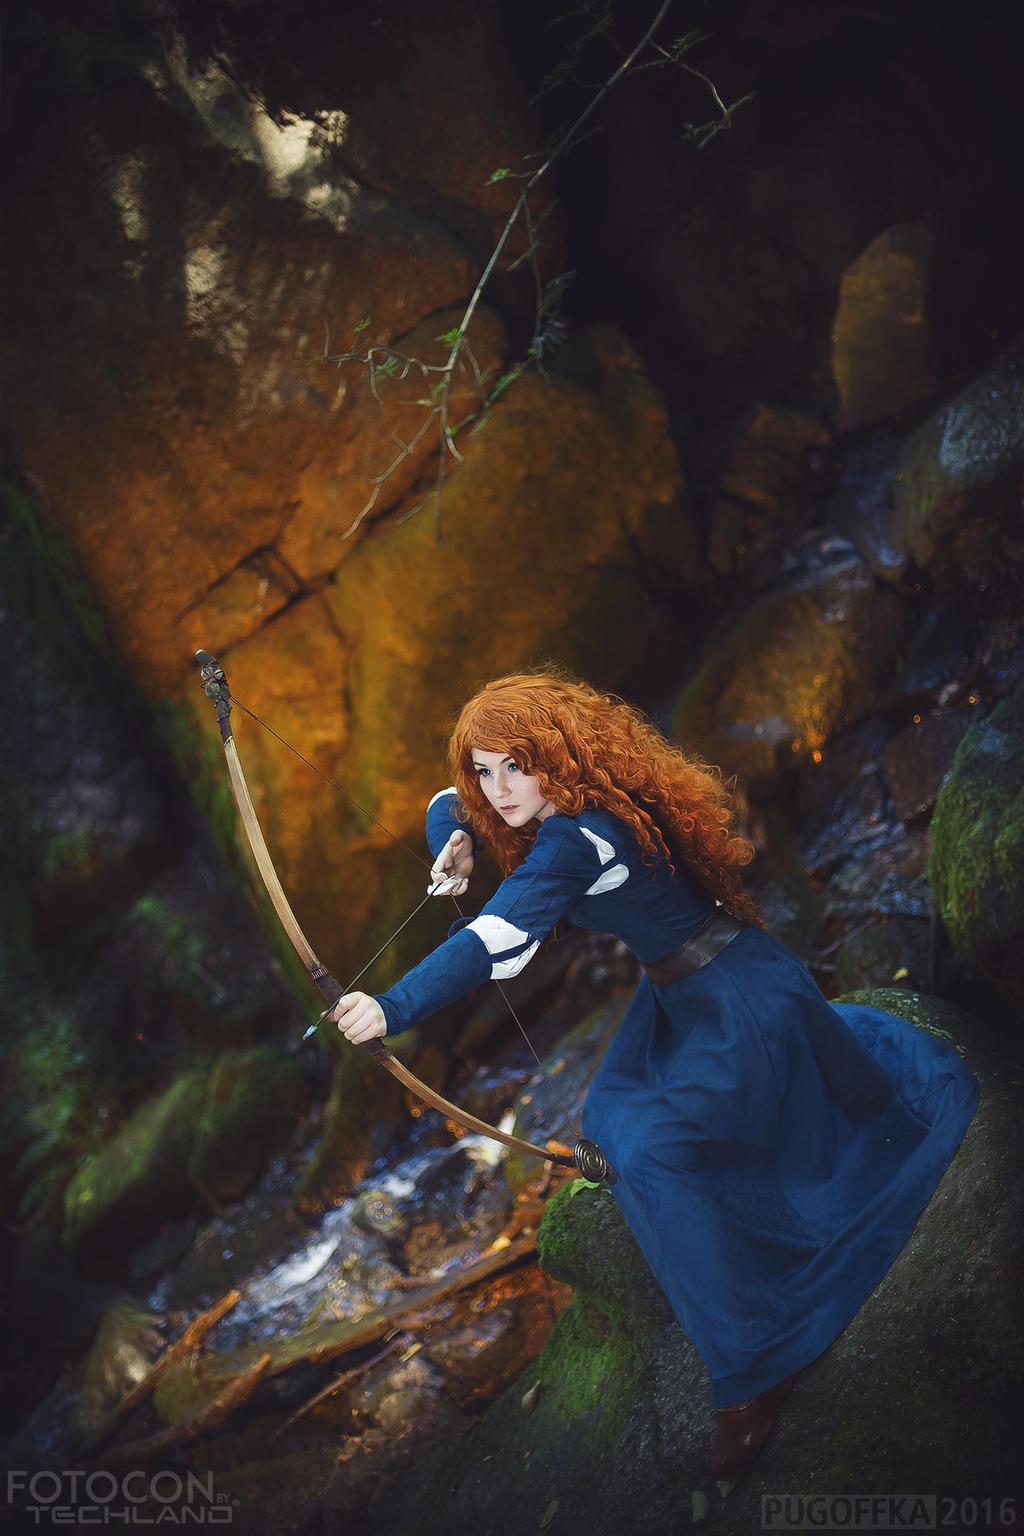 Merida - the Brave princess by Shappi